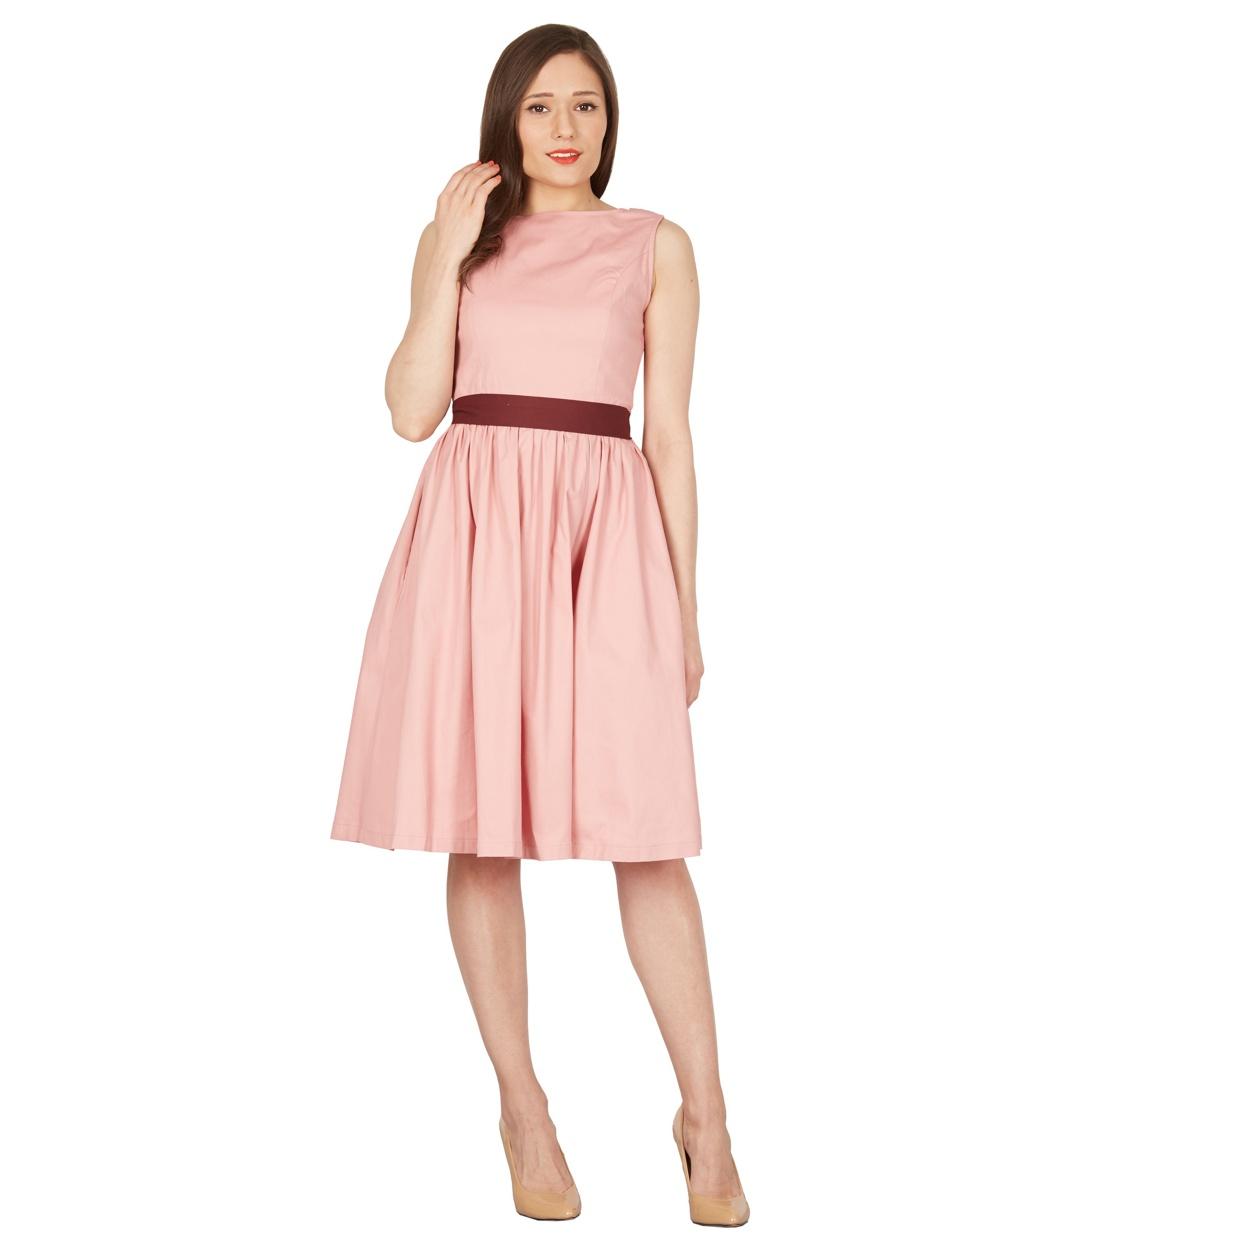 e6b6c57e49f5 Lindy Bop Audrey Svetlo-Ružové Šaty - JoyStore.sk